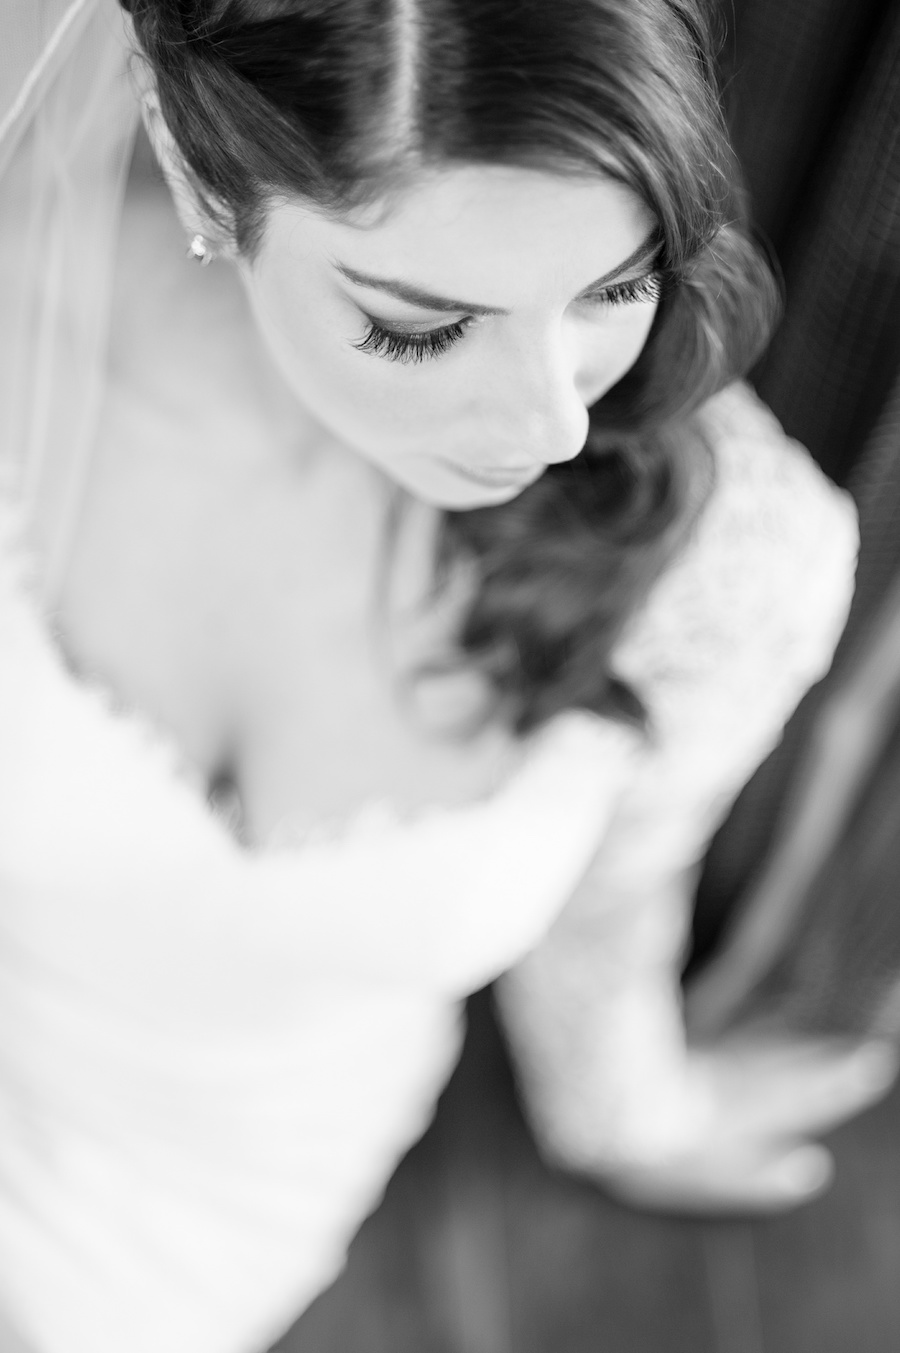 Bridal Beauty Portrait Hair and Makeup Detail | Tampa Wedding Photographer Andi Diamond Photography | Lindsay Does Makeup